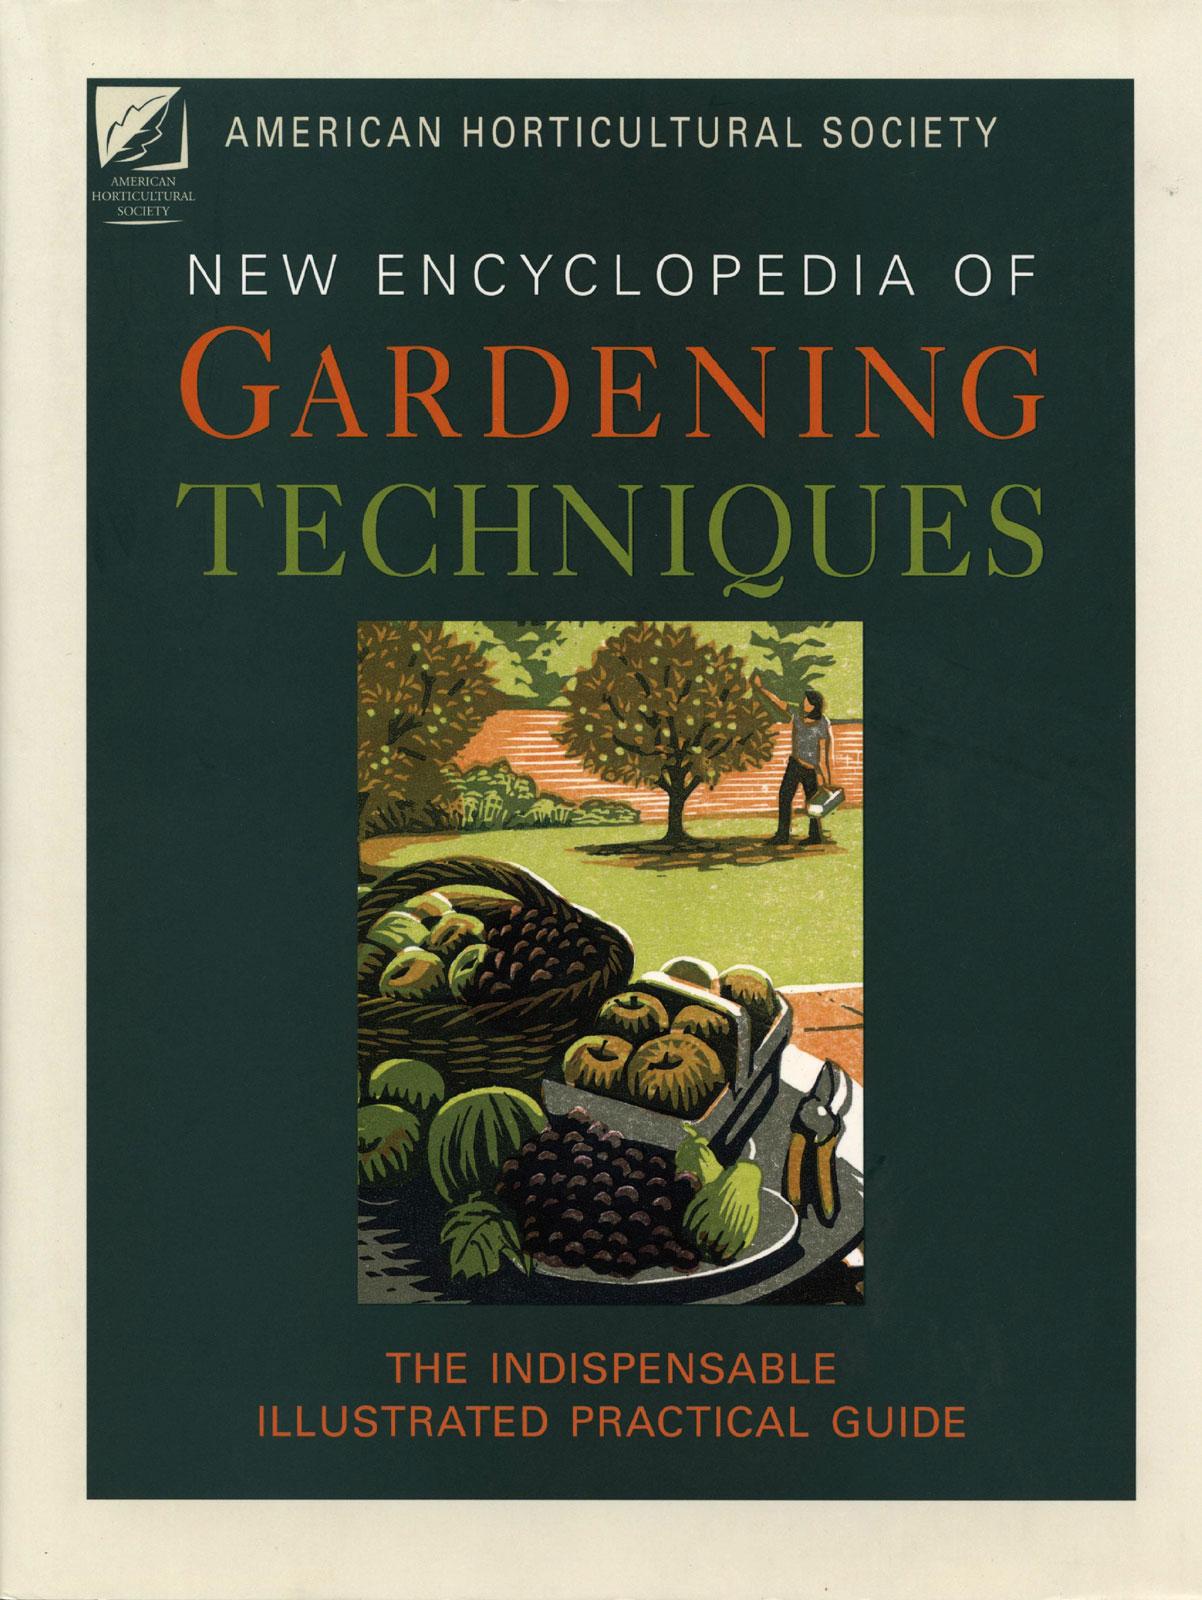 New Encyclopedia Of Gardening Techniques - AHS